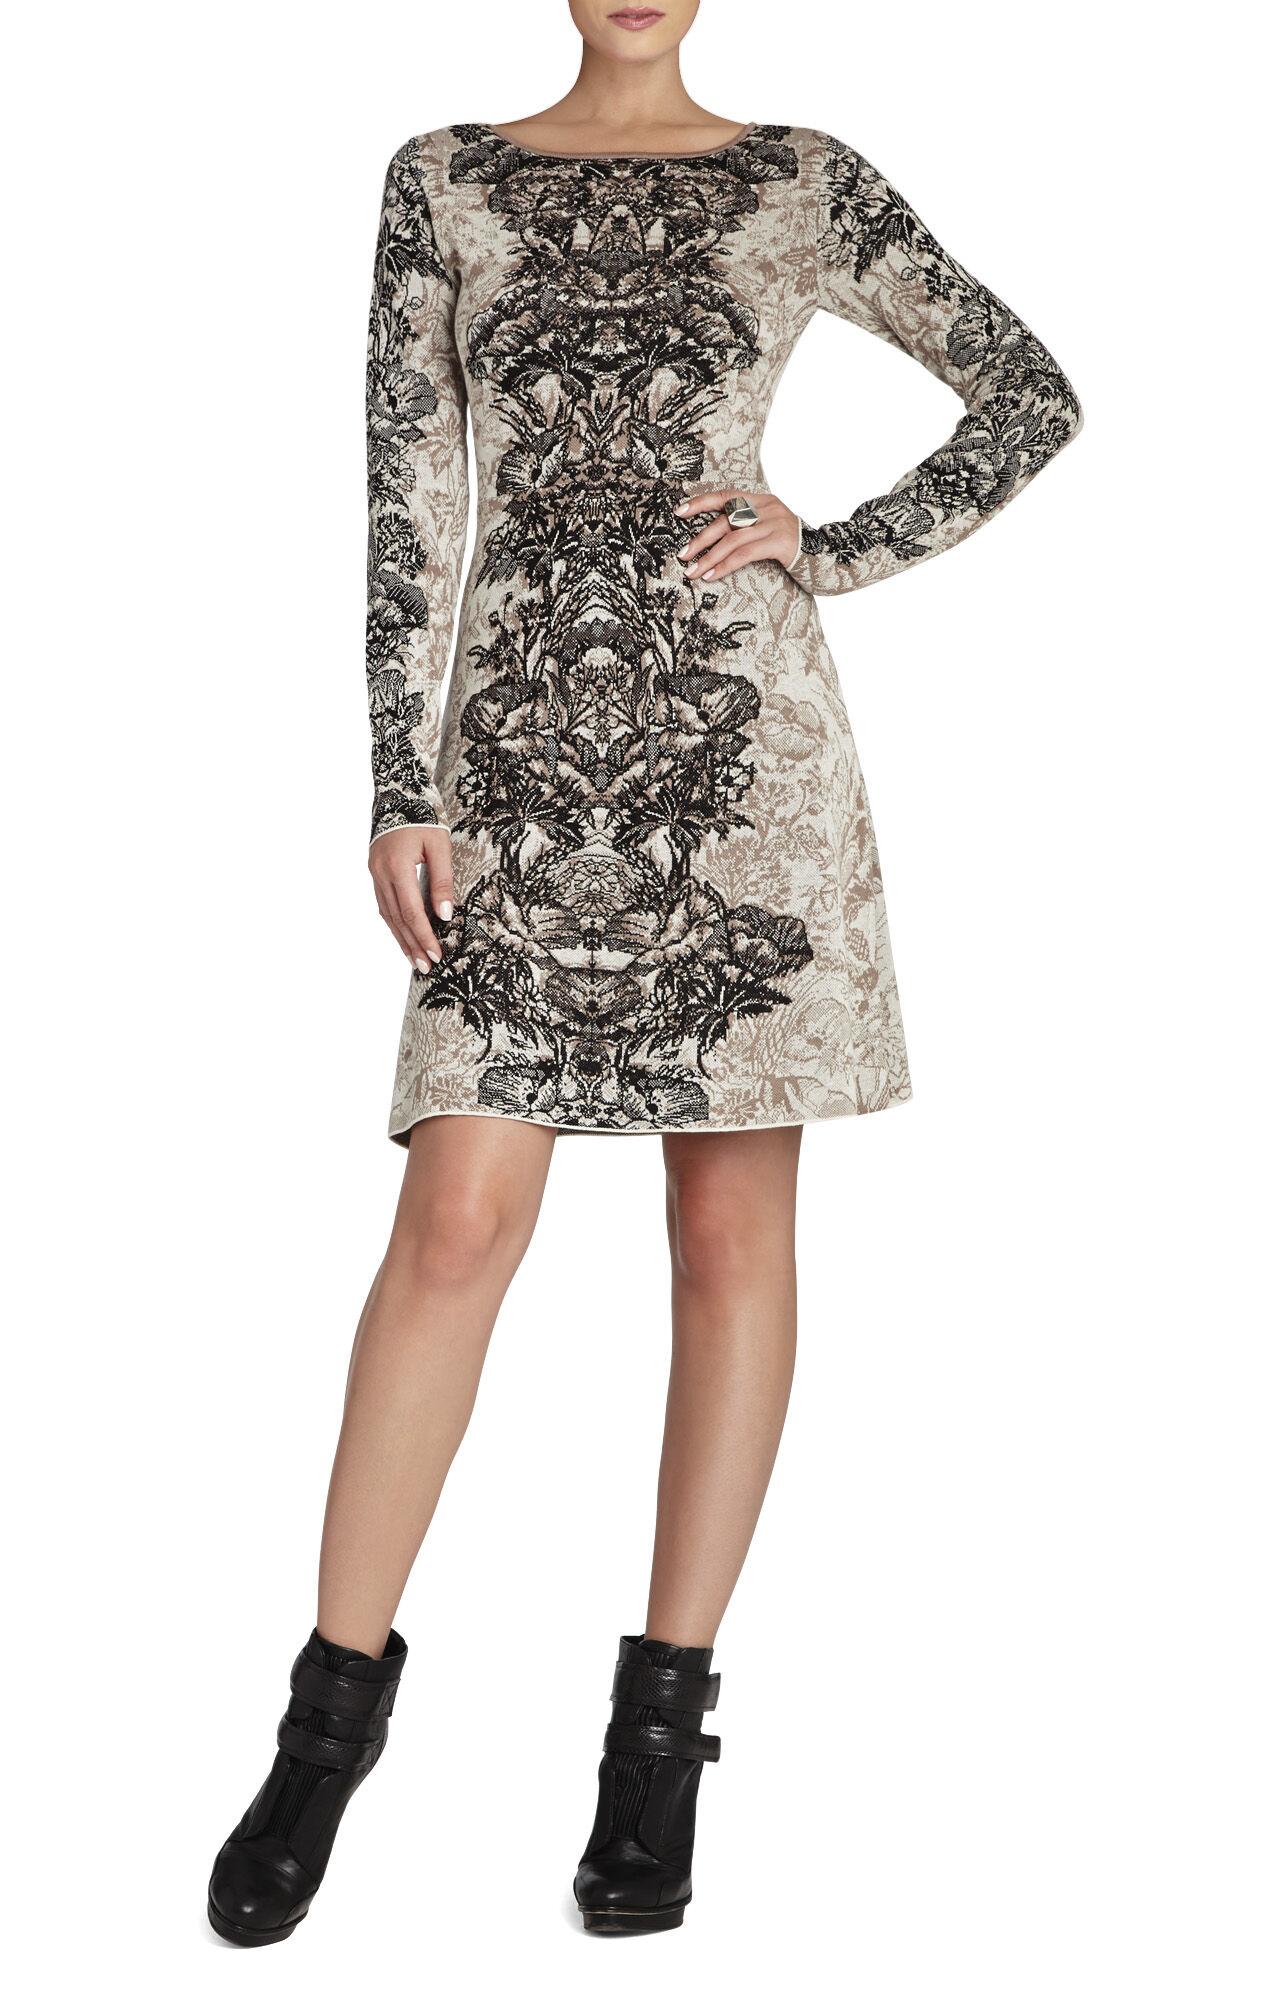 Regan Etched Floral Dress